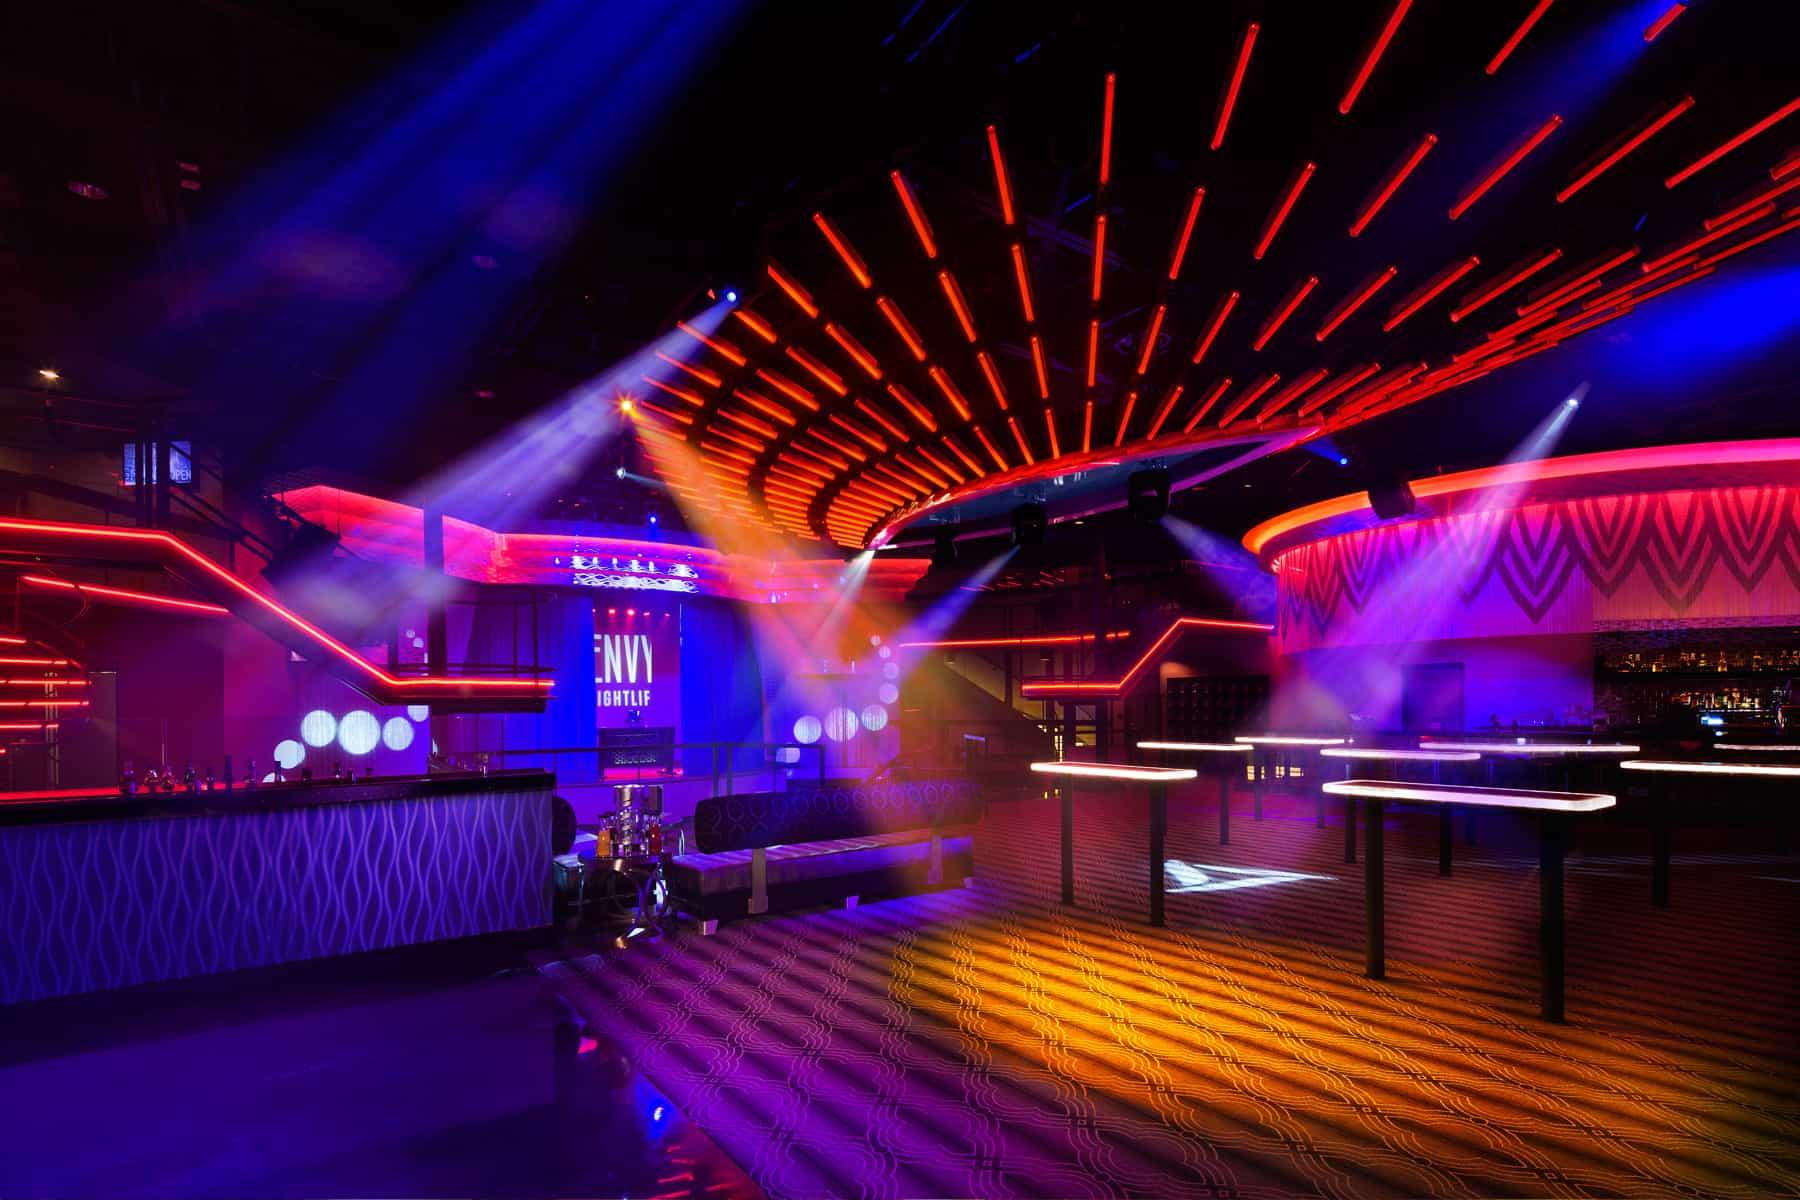 route-66-casino_envy-nightlife_lighitng-design2-1800x1200